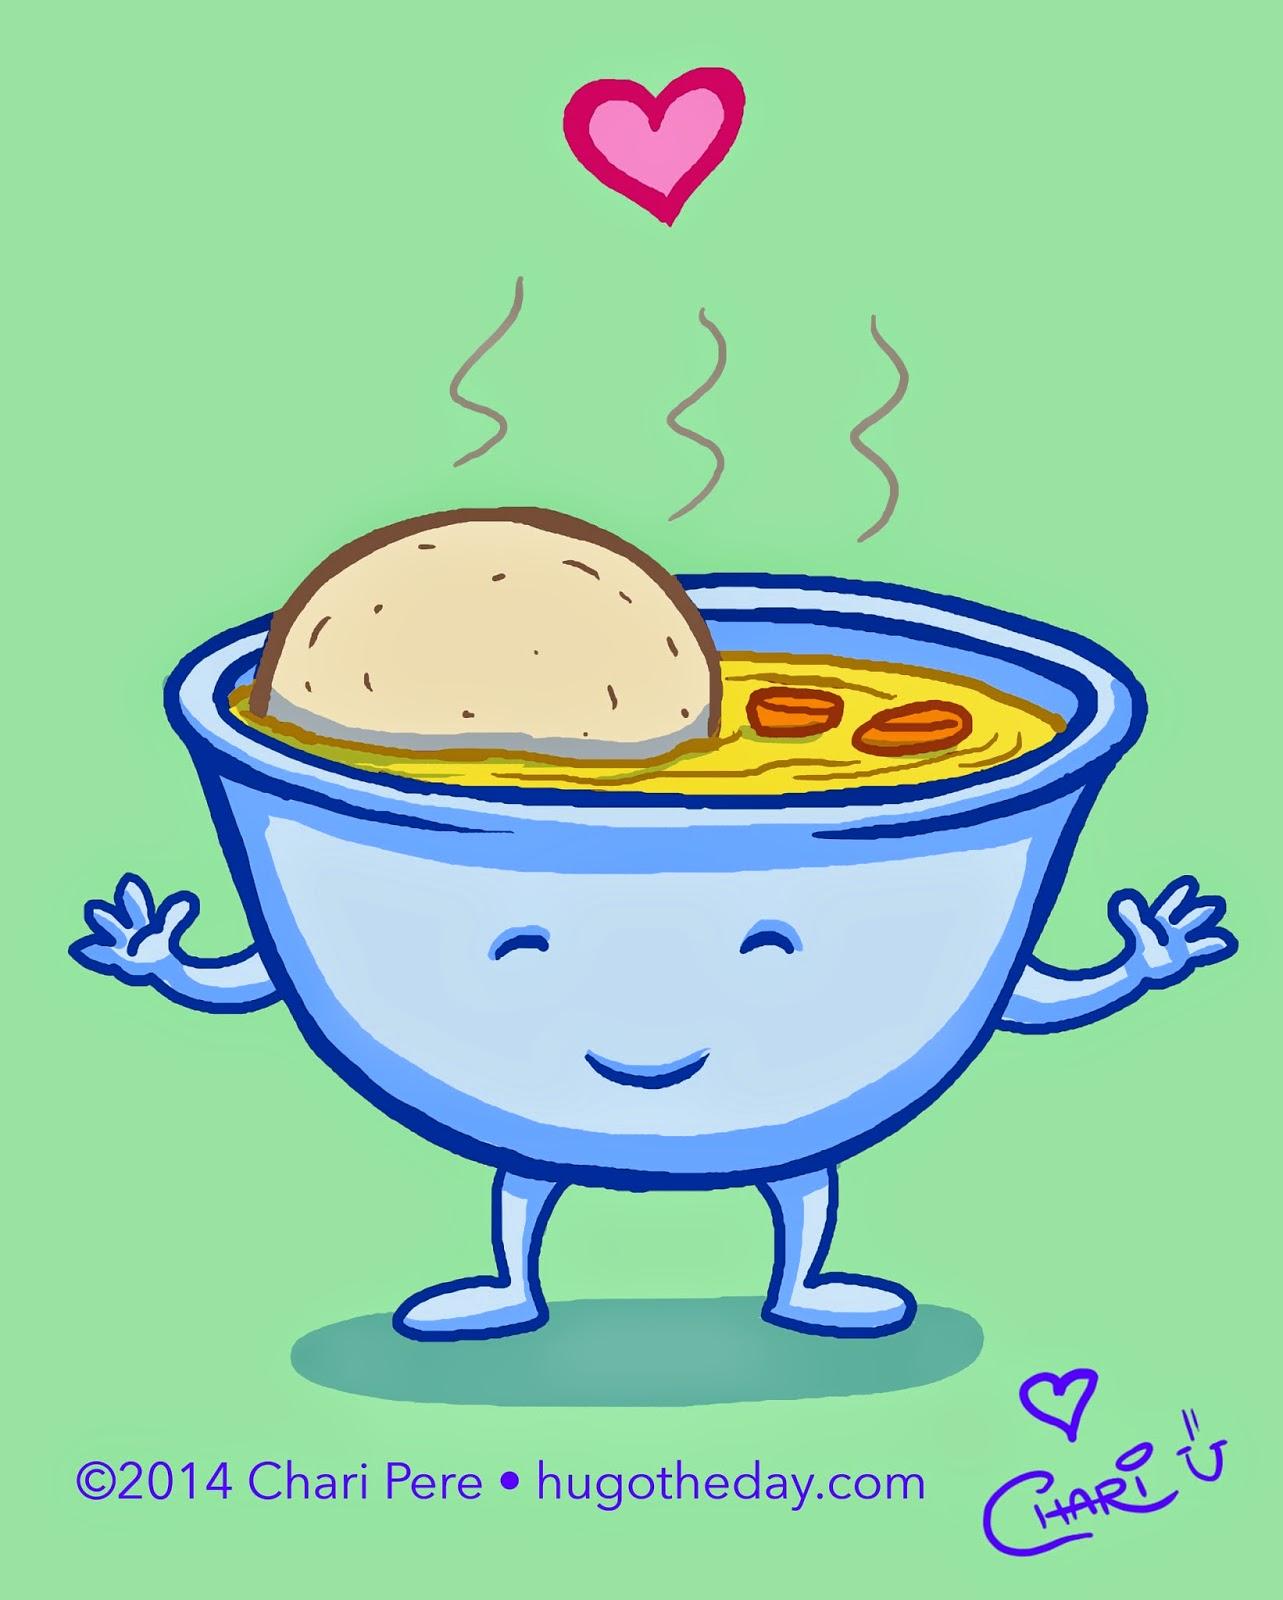 Soup clipart matzo ball soup. Hug o the day